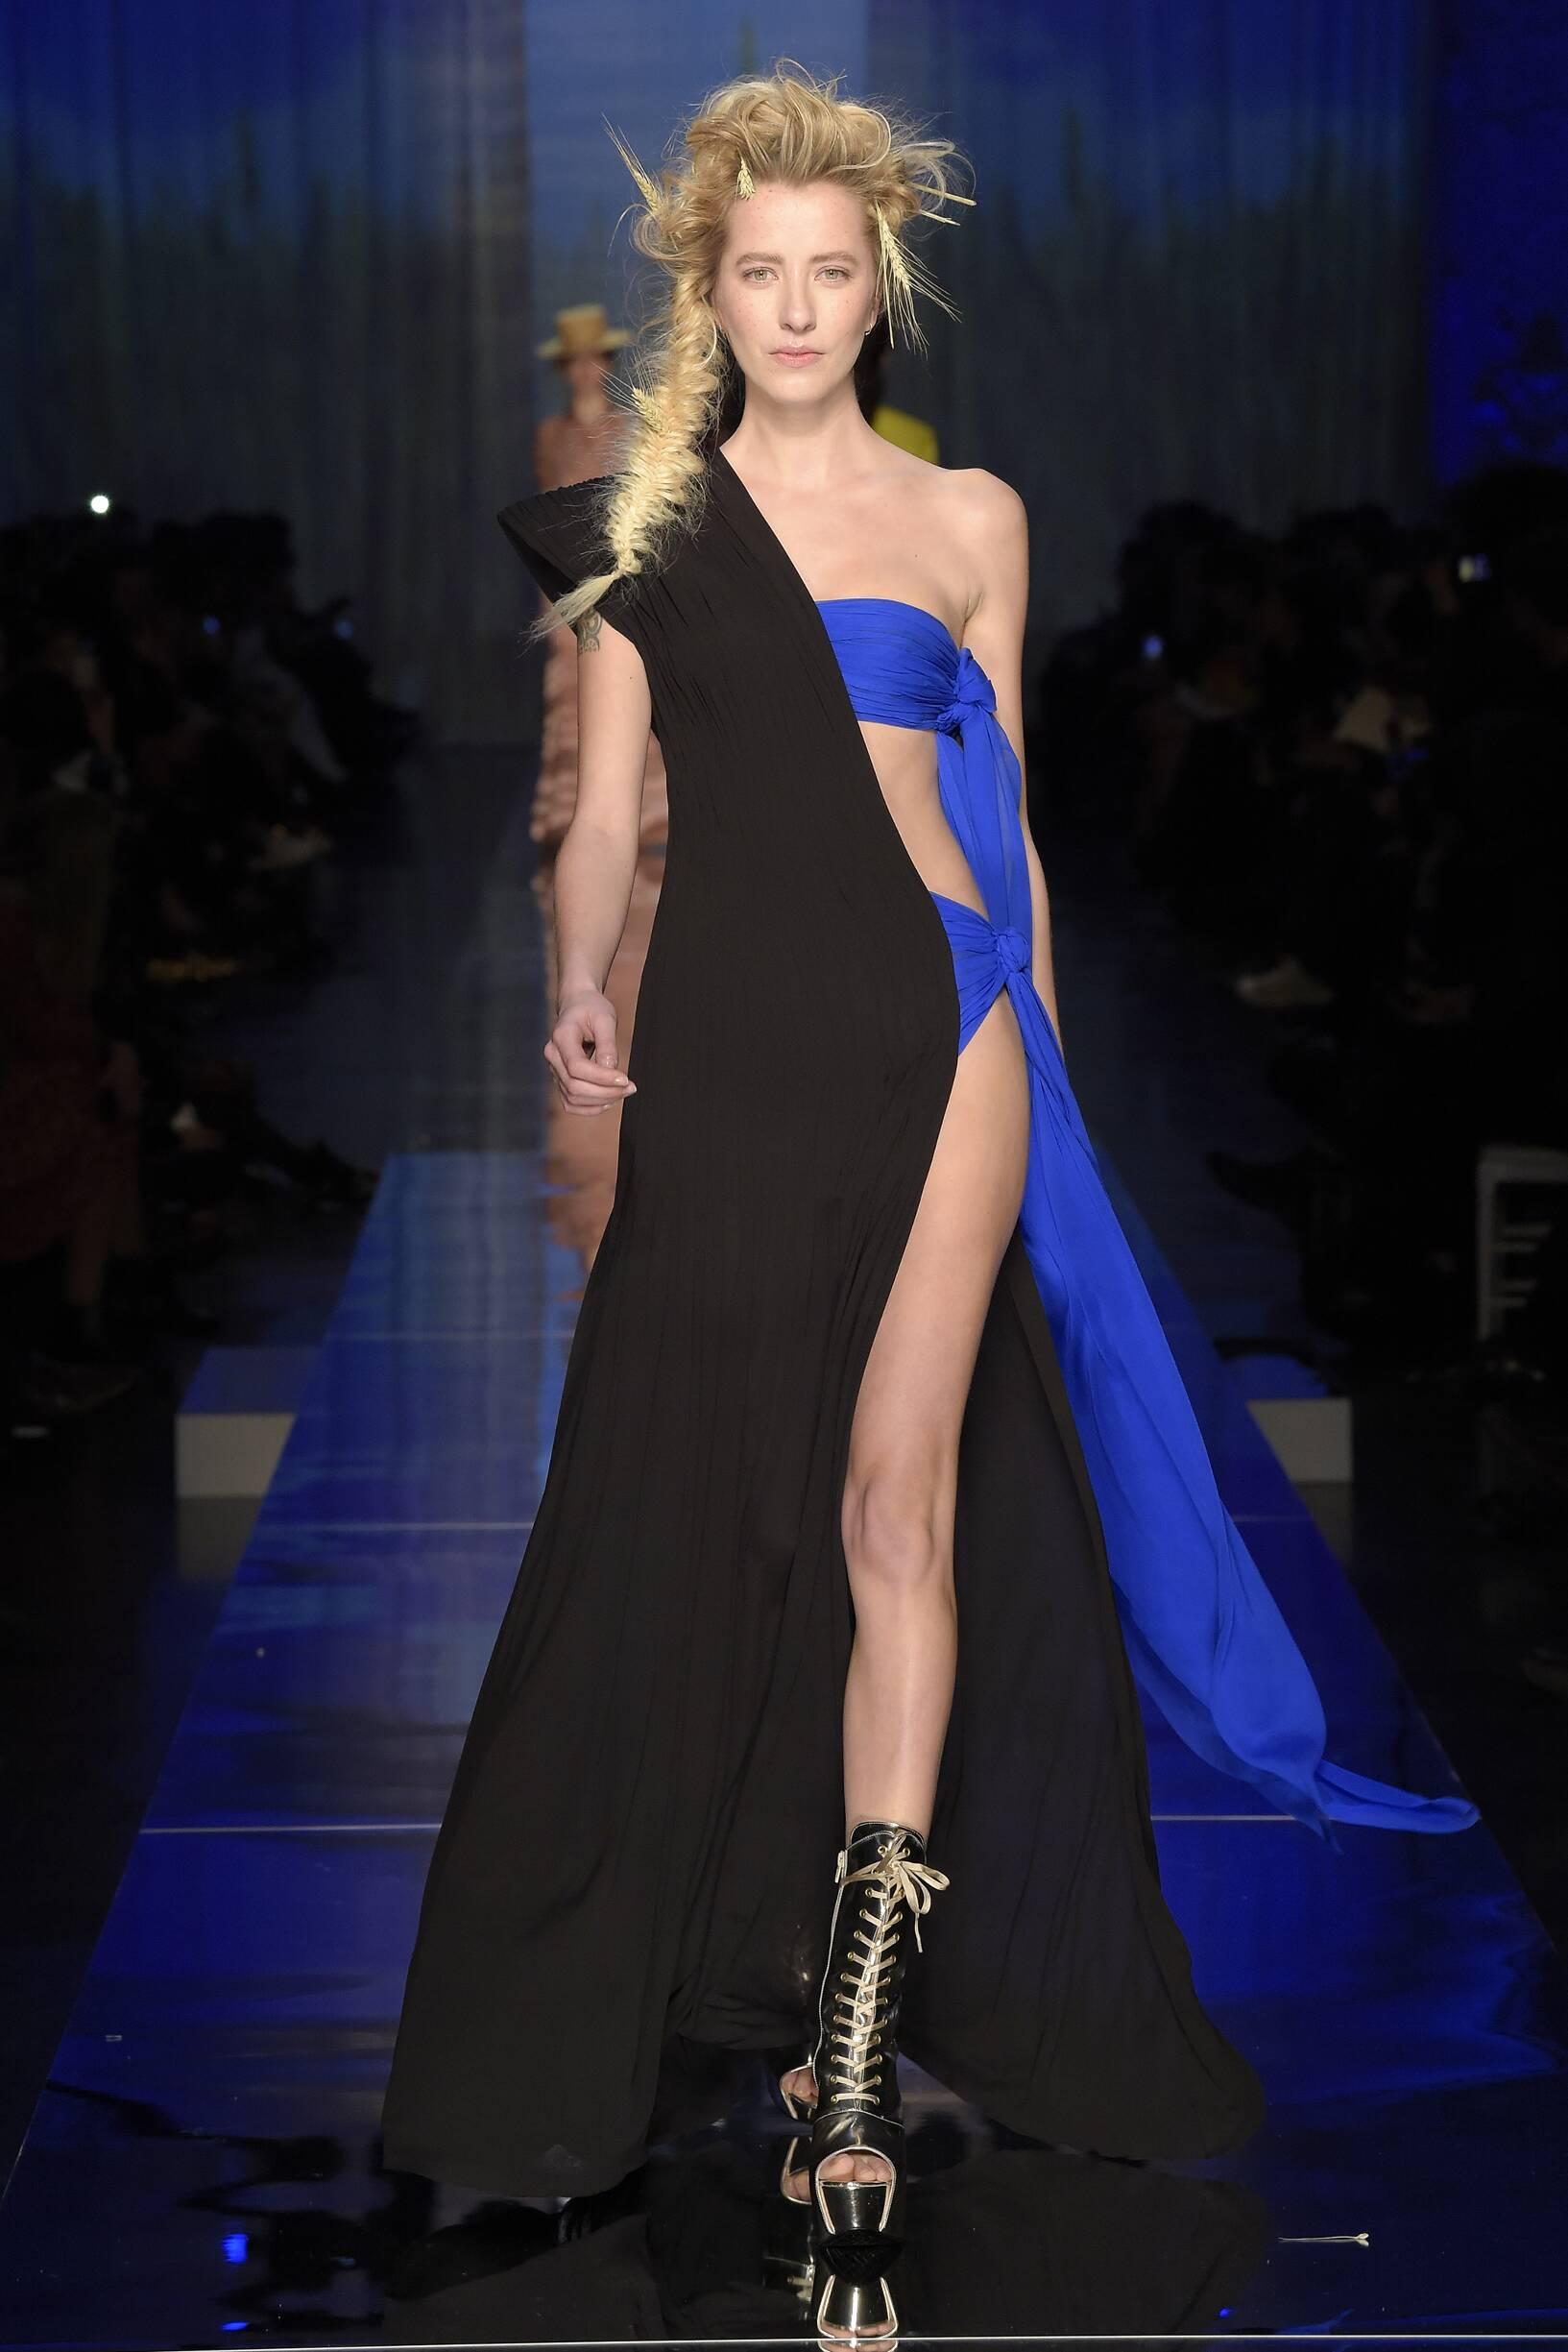 2017 Woman Jean Paul Gaultier Haute Couture Summer Catwalk